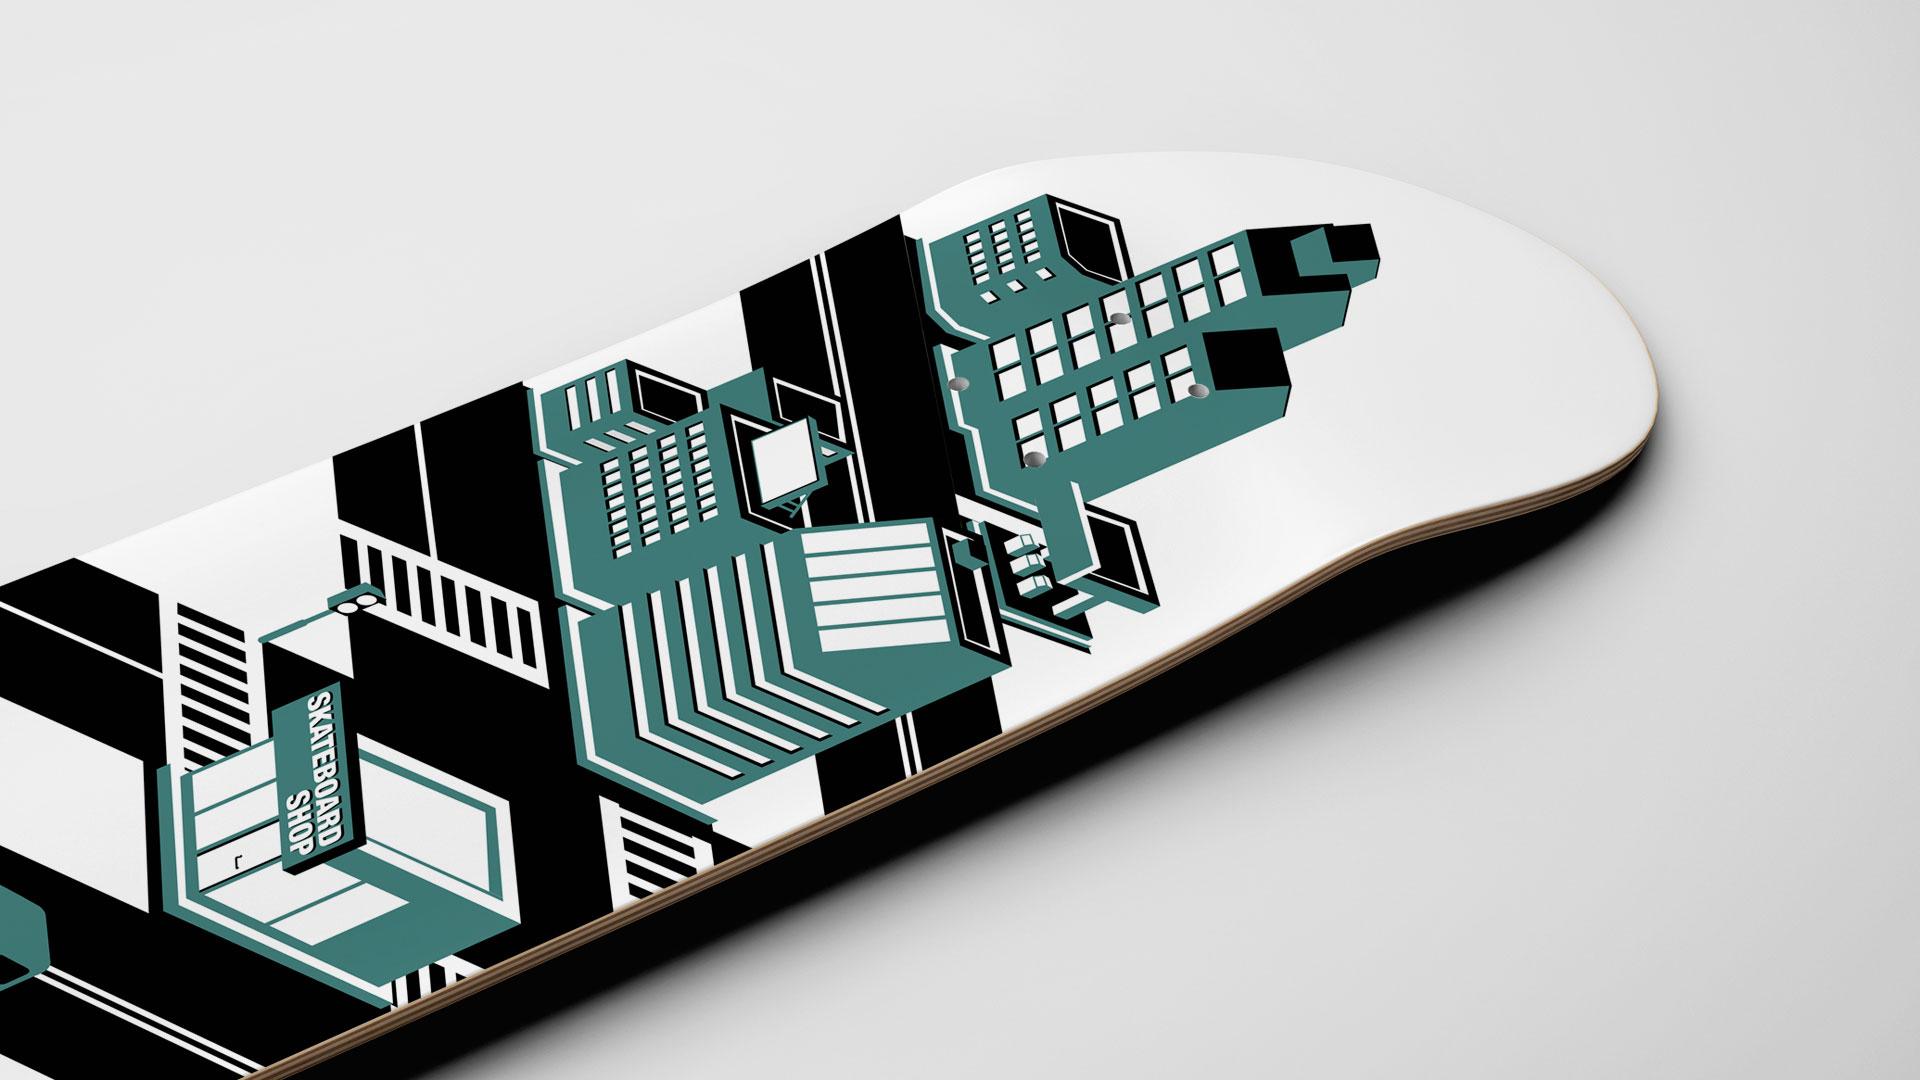 1b_decks_design_graphic_lanikai_skate